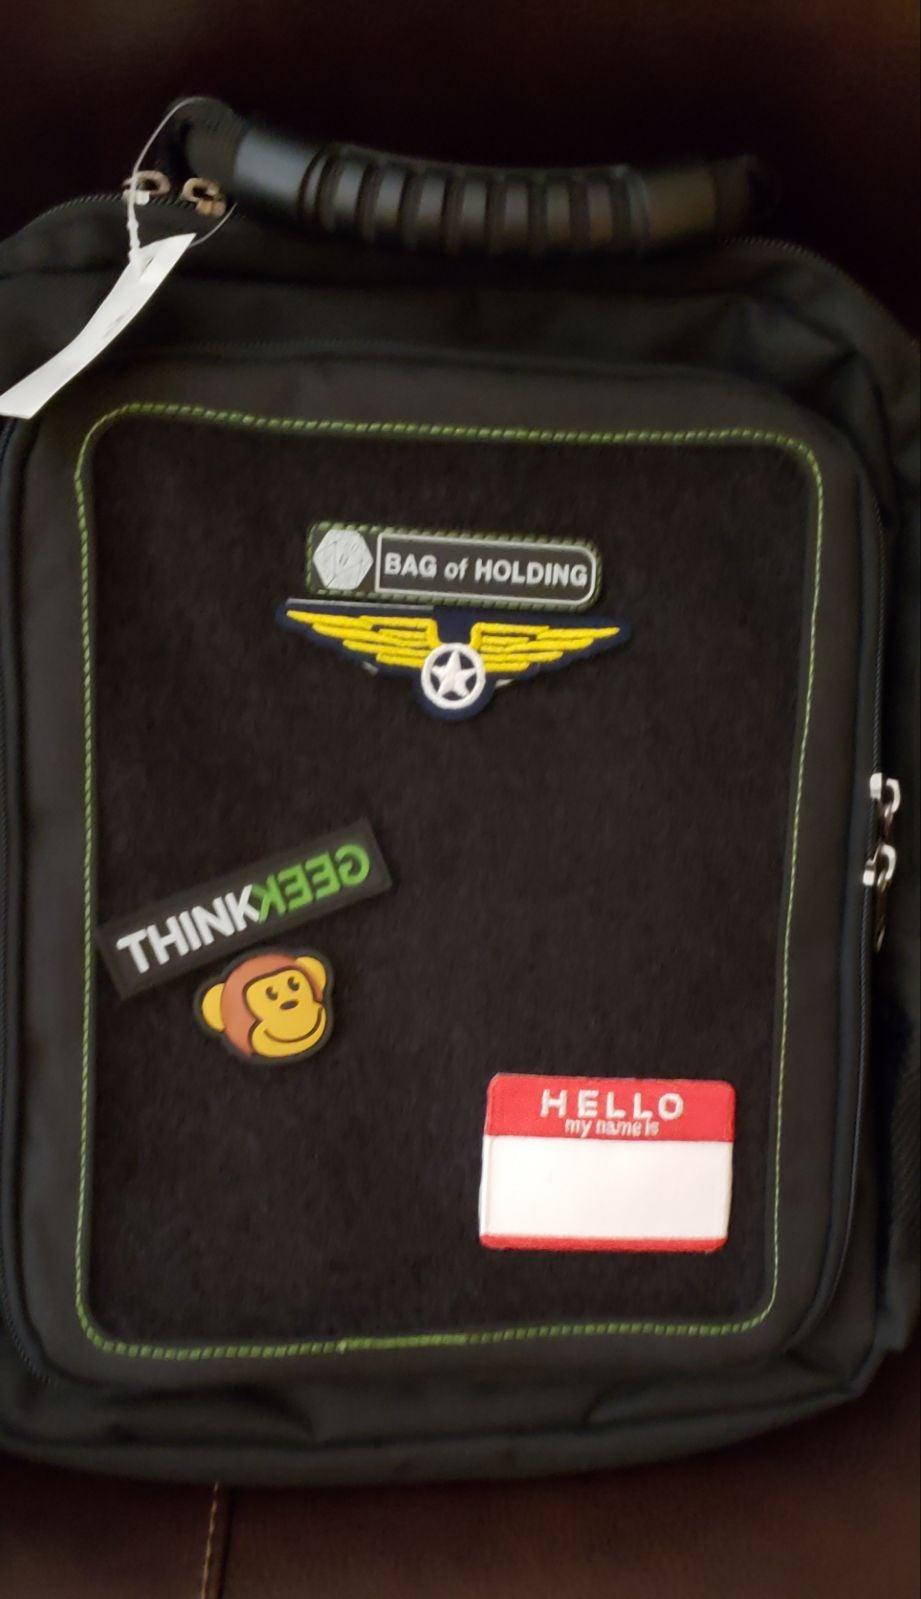 ThinkGeek Bag of Holding